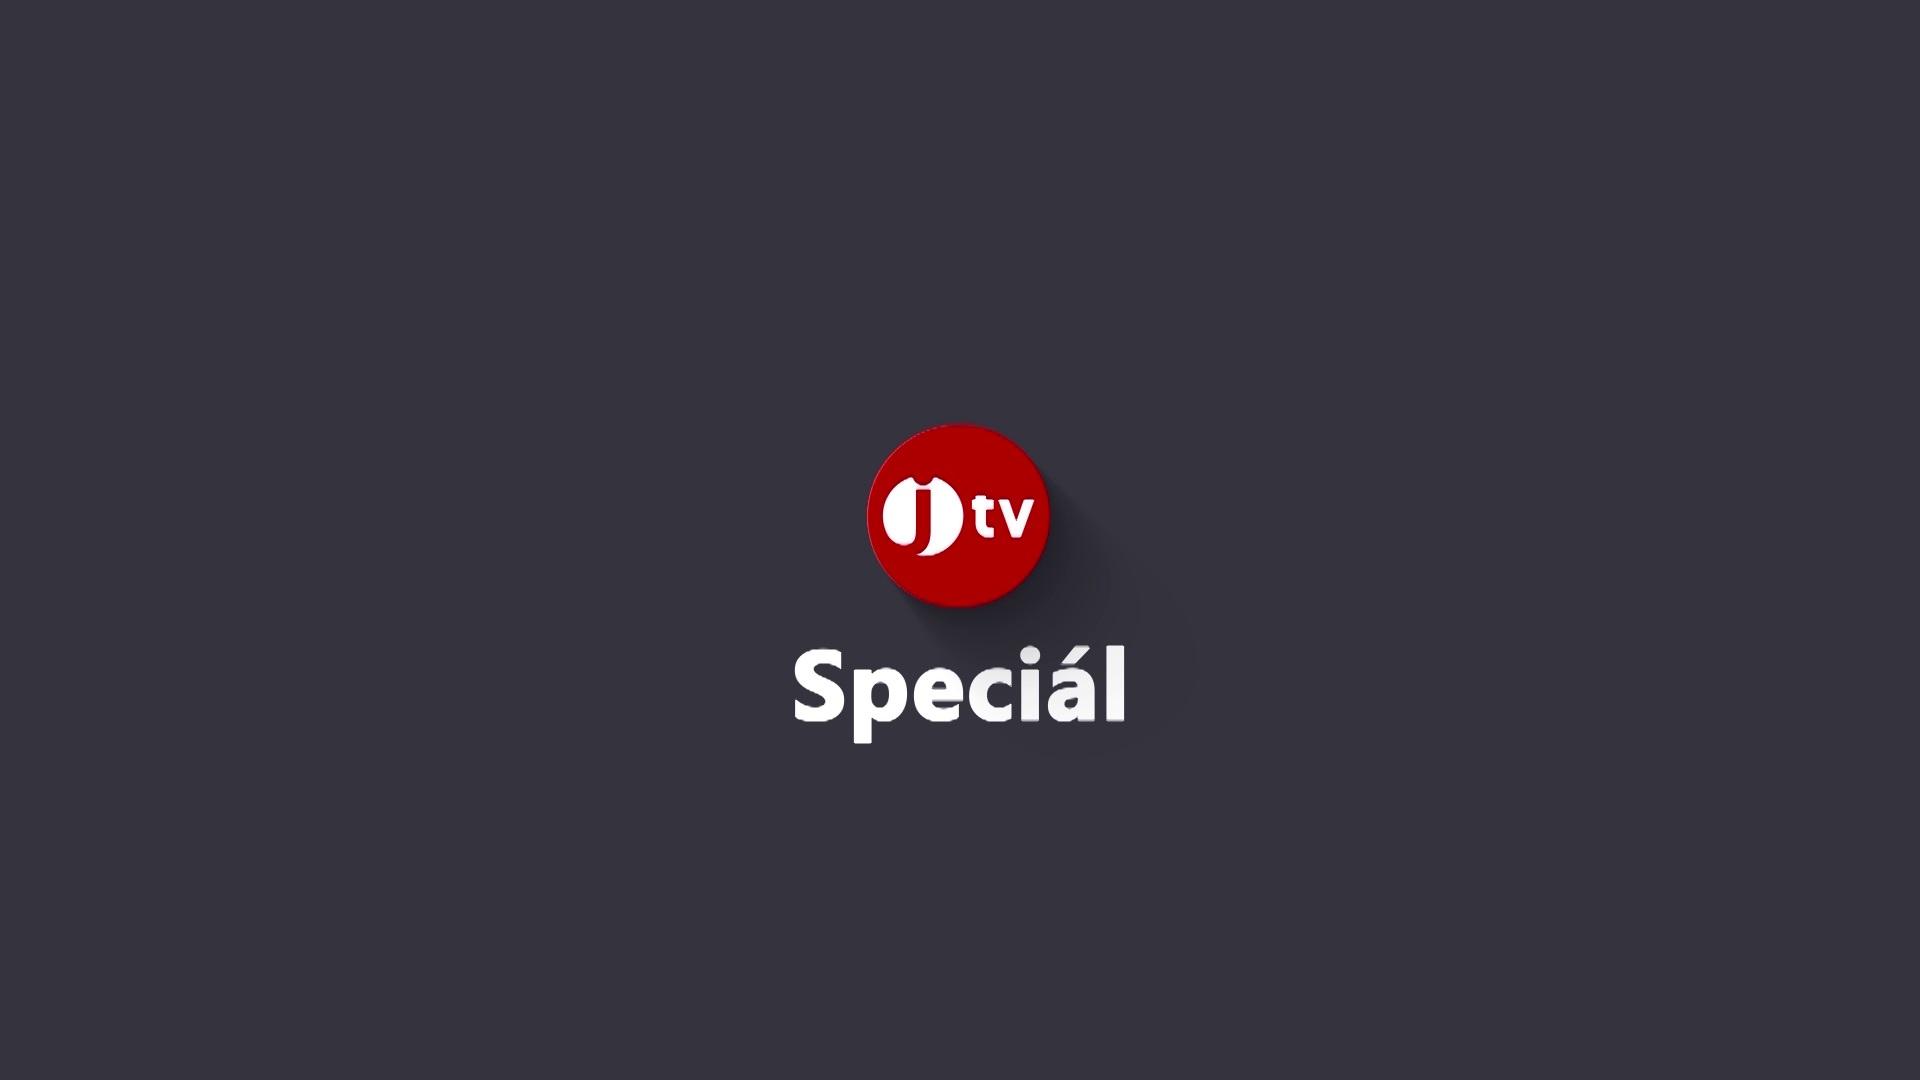 JTV SPECIÁL